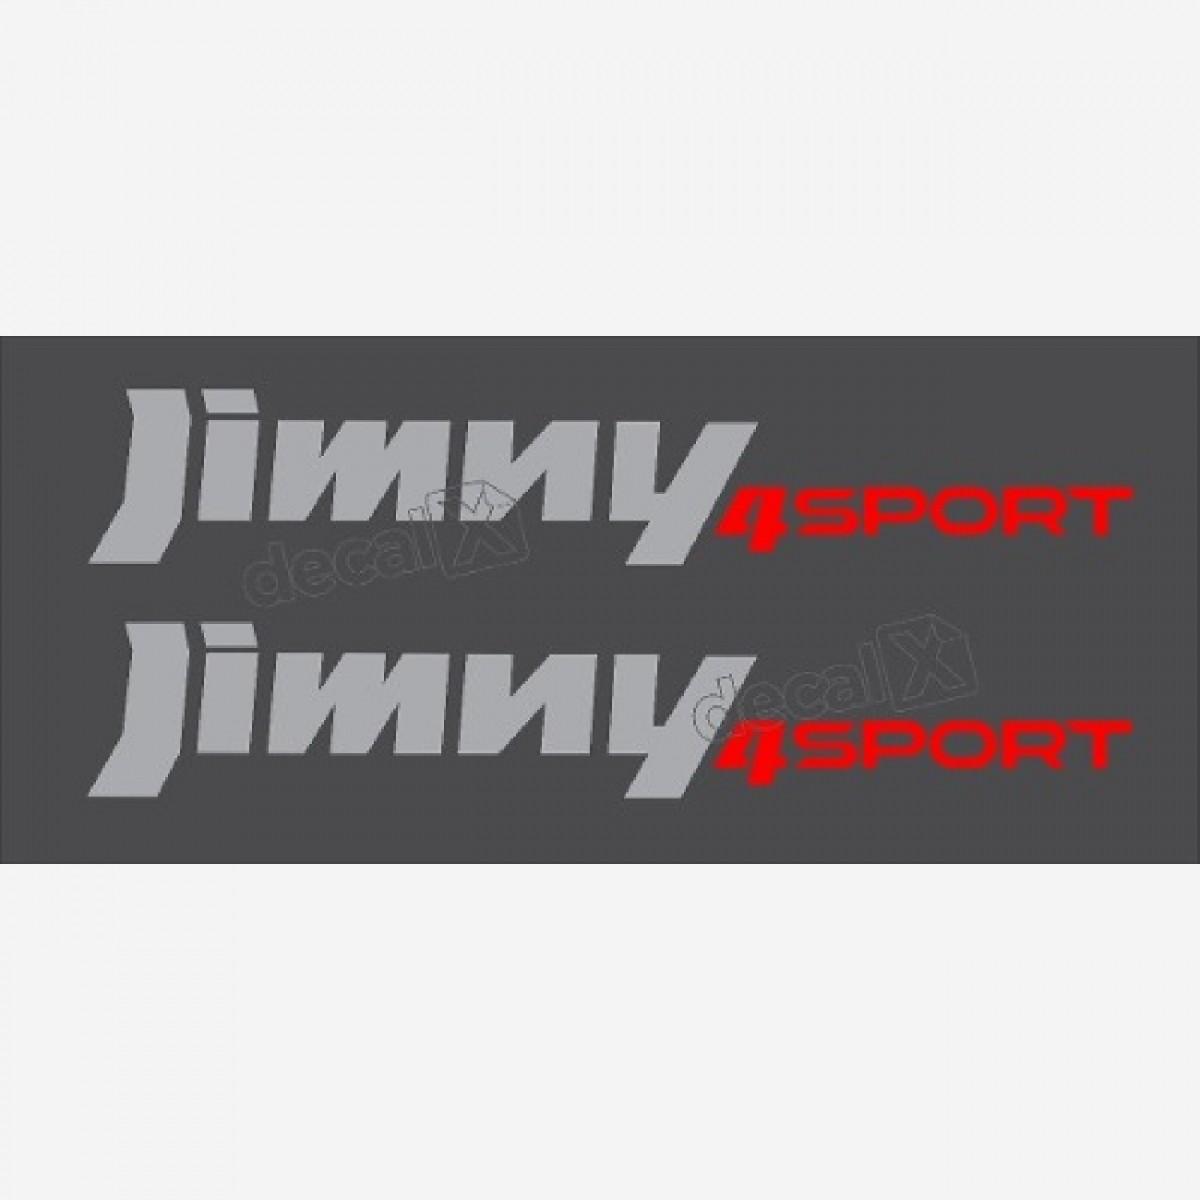 Embelma Adesivo Suzuki Jimny 4sport Par